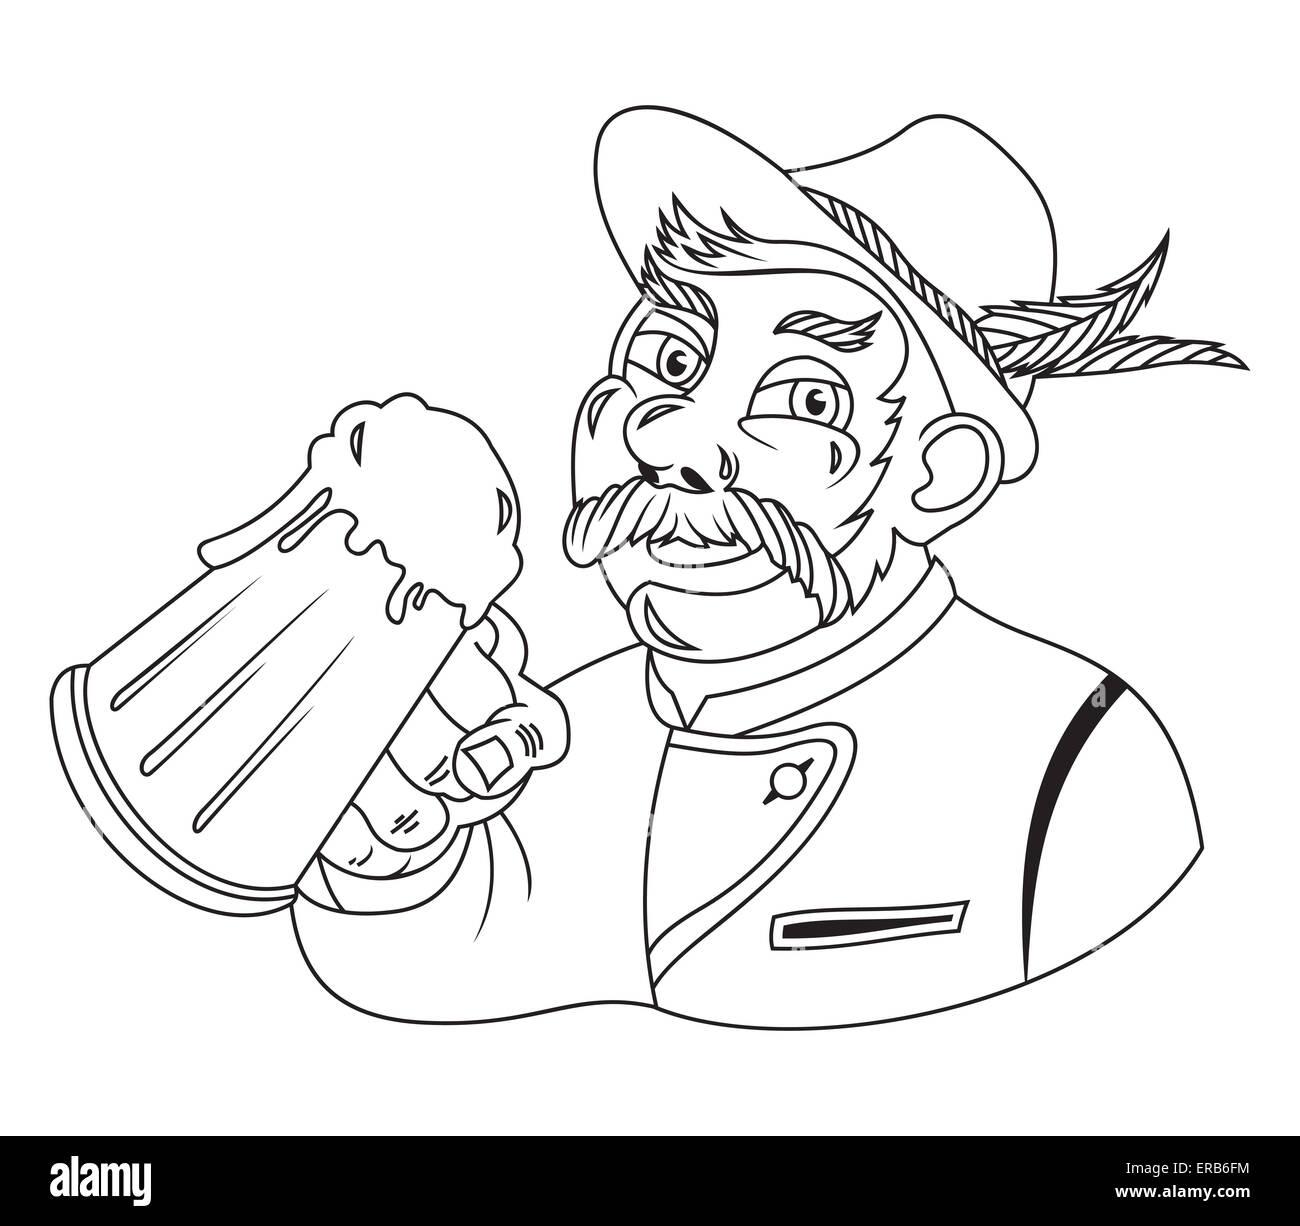 Vector illustration of the Oktoberfest sign - Stock Image